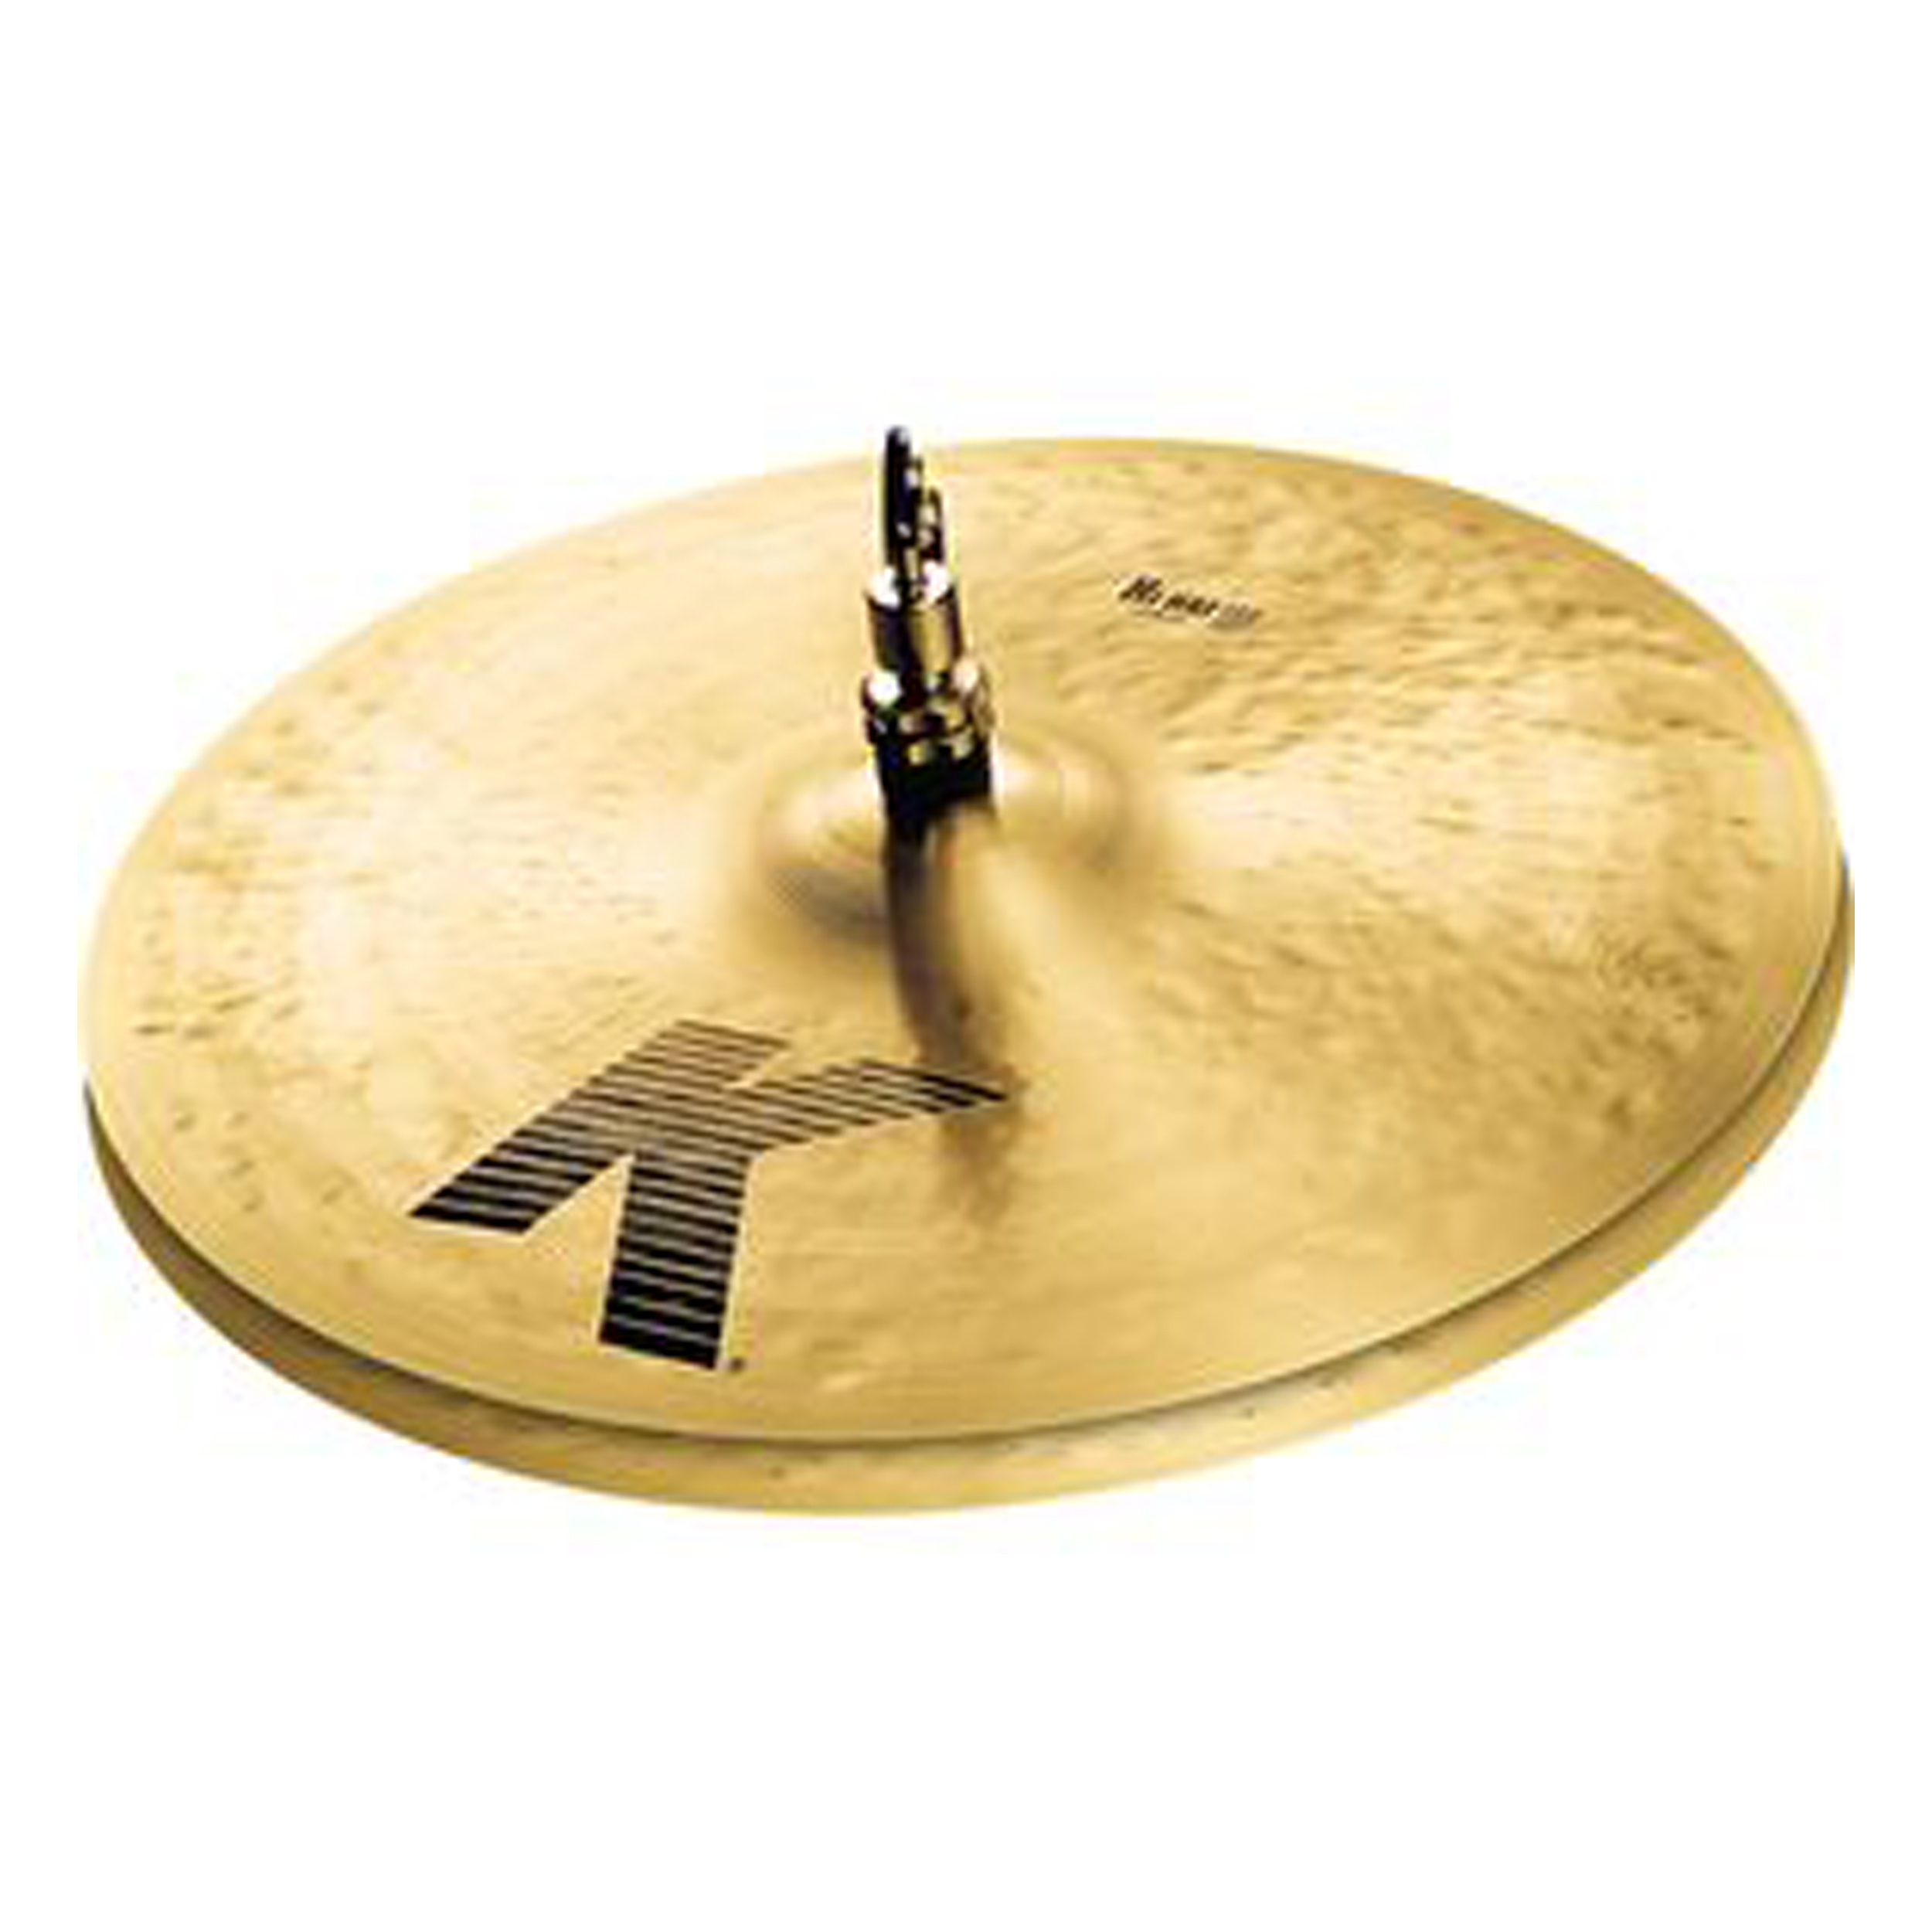 "Zildjian K Series 14"" Hi Hat Cymbals by Zildjian"